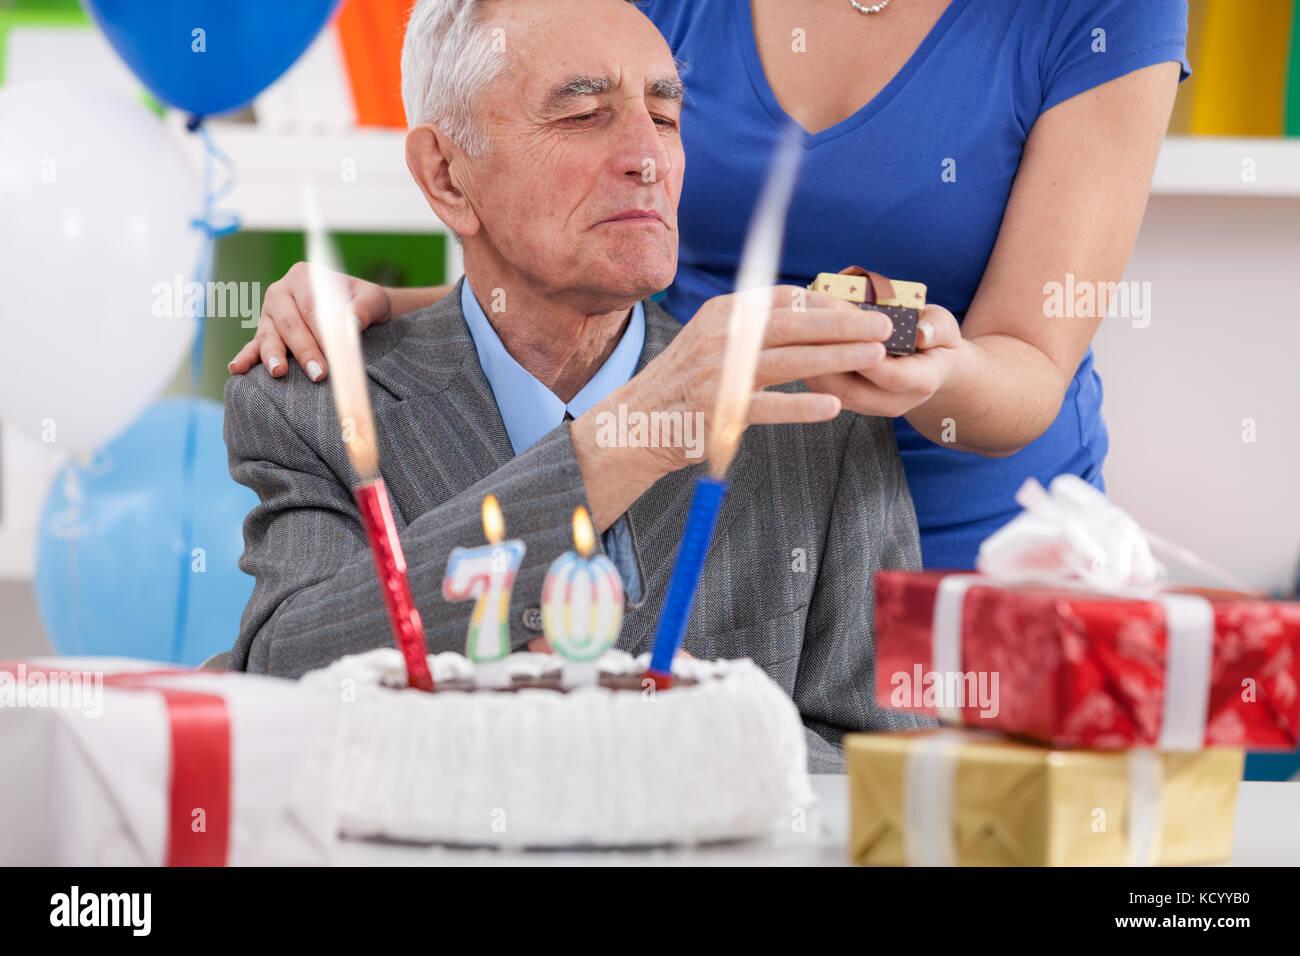 Senior Man Celebrating 70th Birthday And Receiving Gift